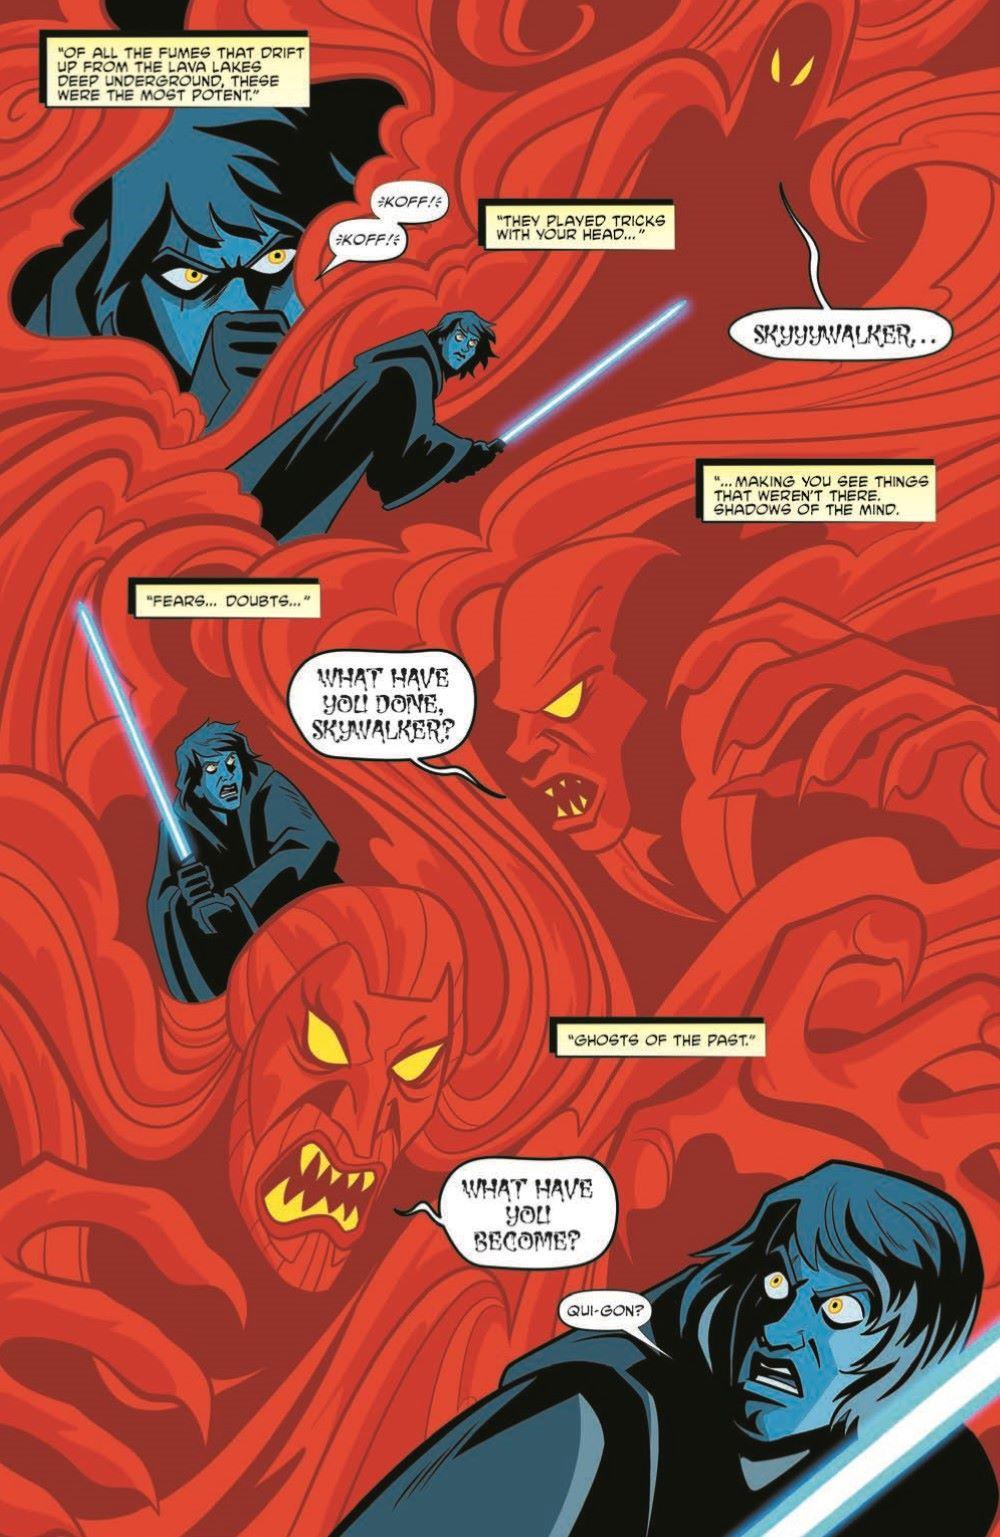 SW_ShadowOfVadersCastle_01-pr-6 ComicList Previews: STAR WARS ADVENTURES SHADOW OF VADER'S CASTLE #1